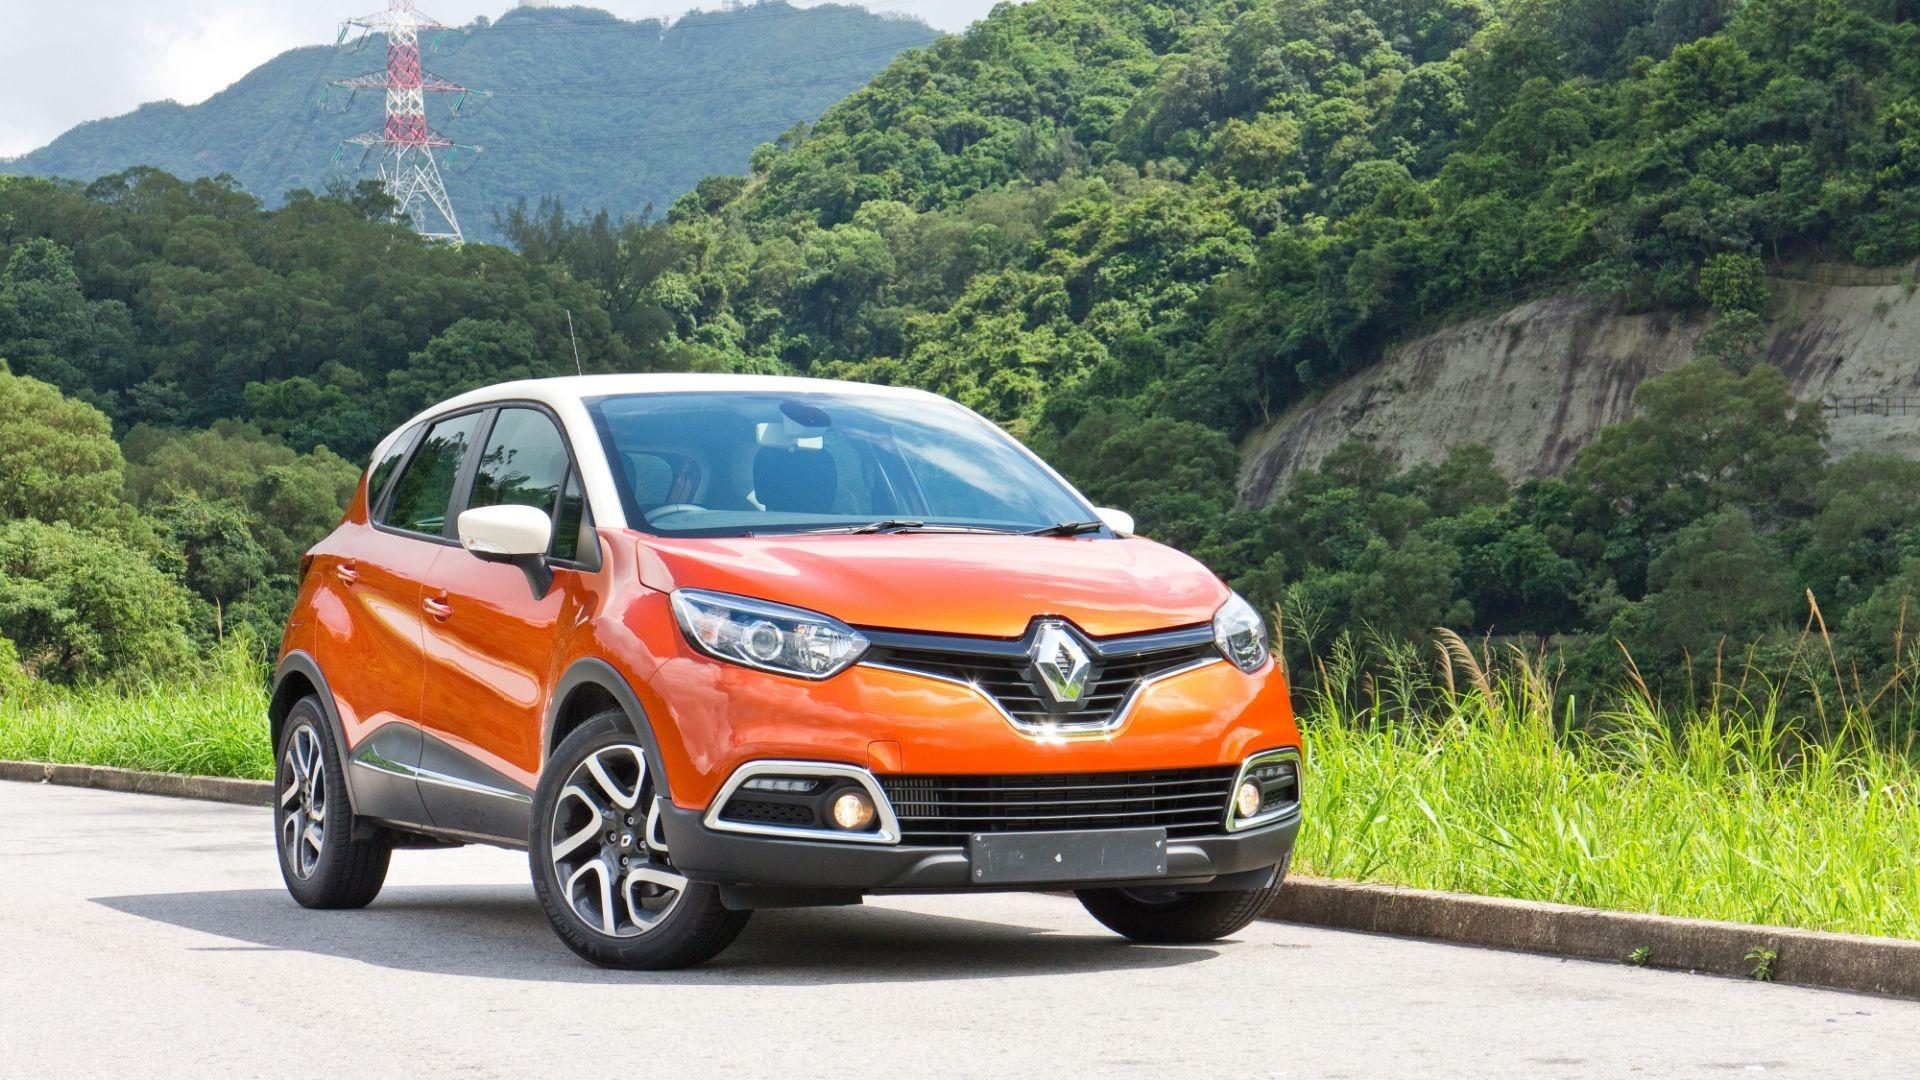 Taller de coches Renault en Villaverde